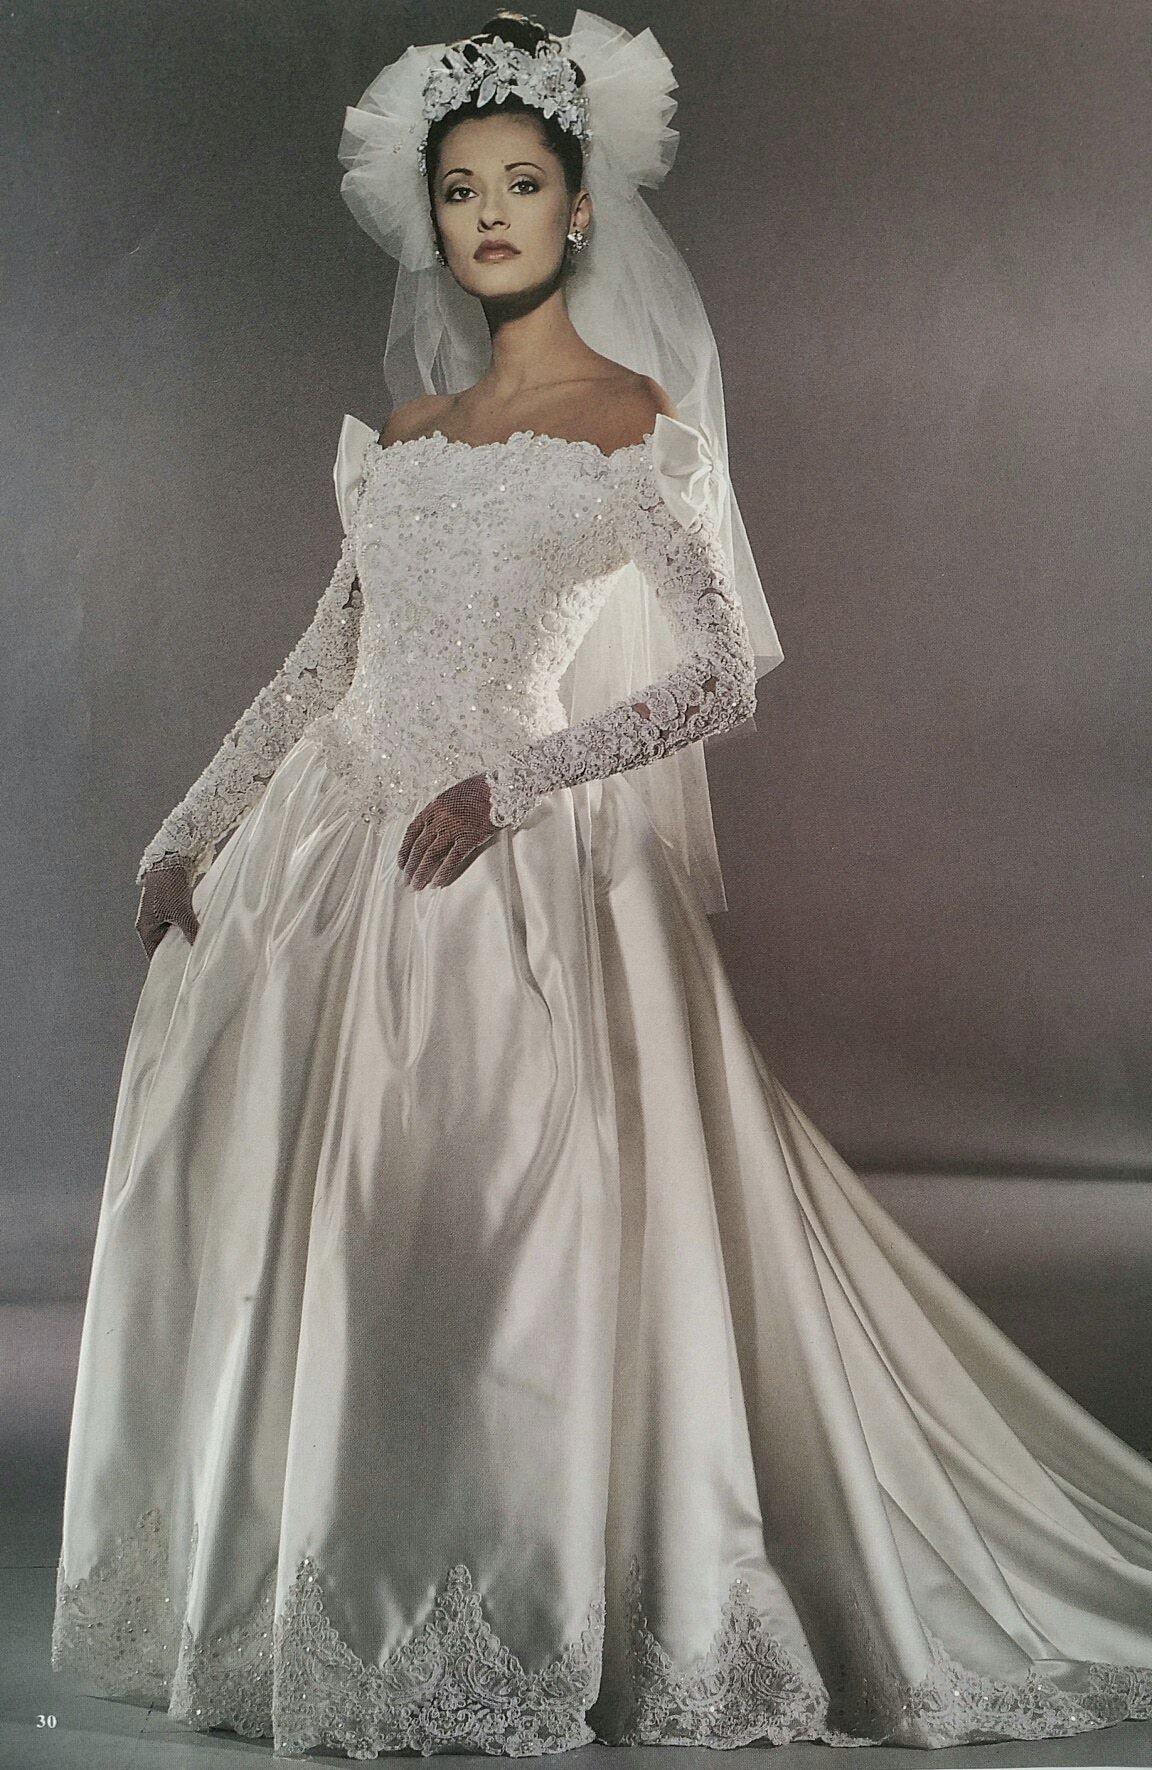 Demetrios 1995 Vintage 1990s Wedding Dress Bridal Magazine Ad